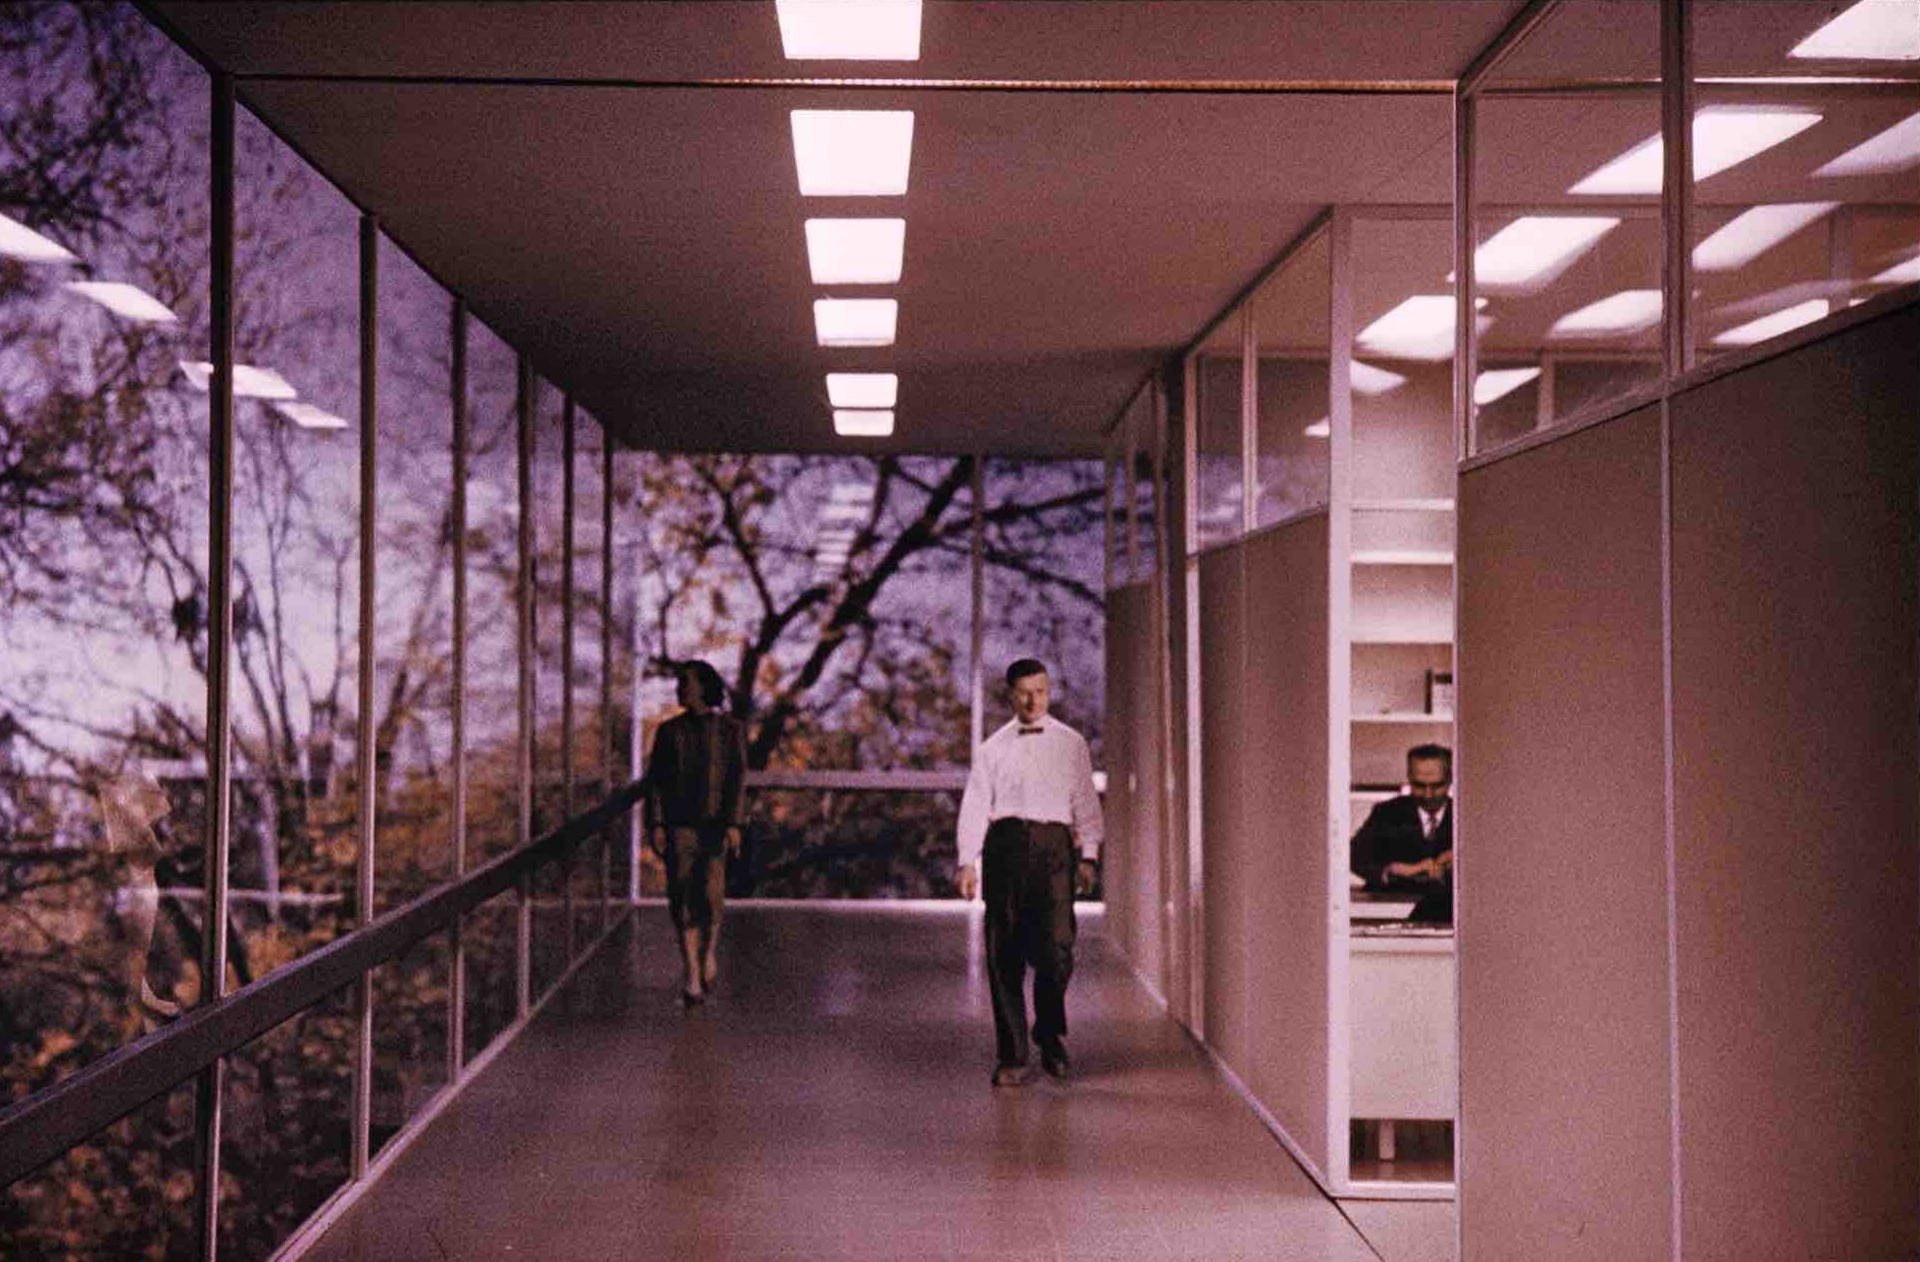 Eero Saarinen, IBM Watson Research Center (Yorktown Heights, NY) 1960